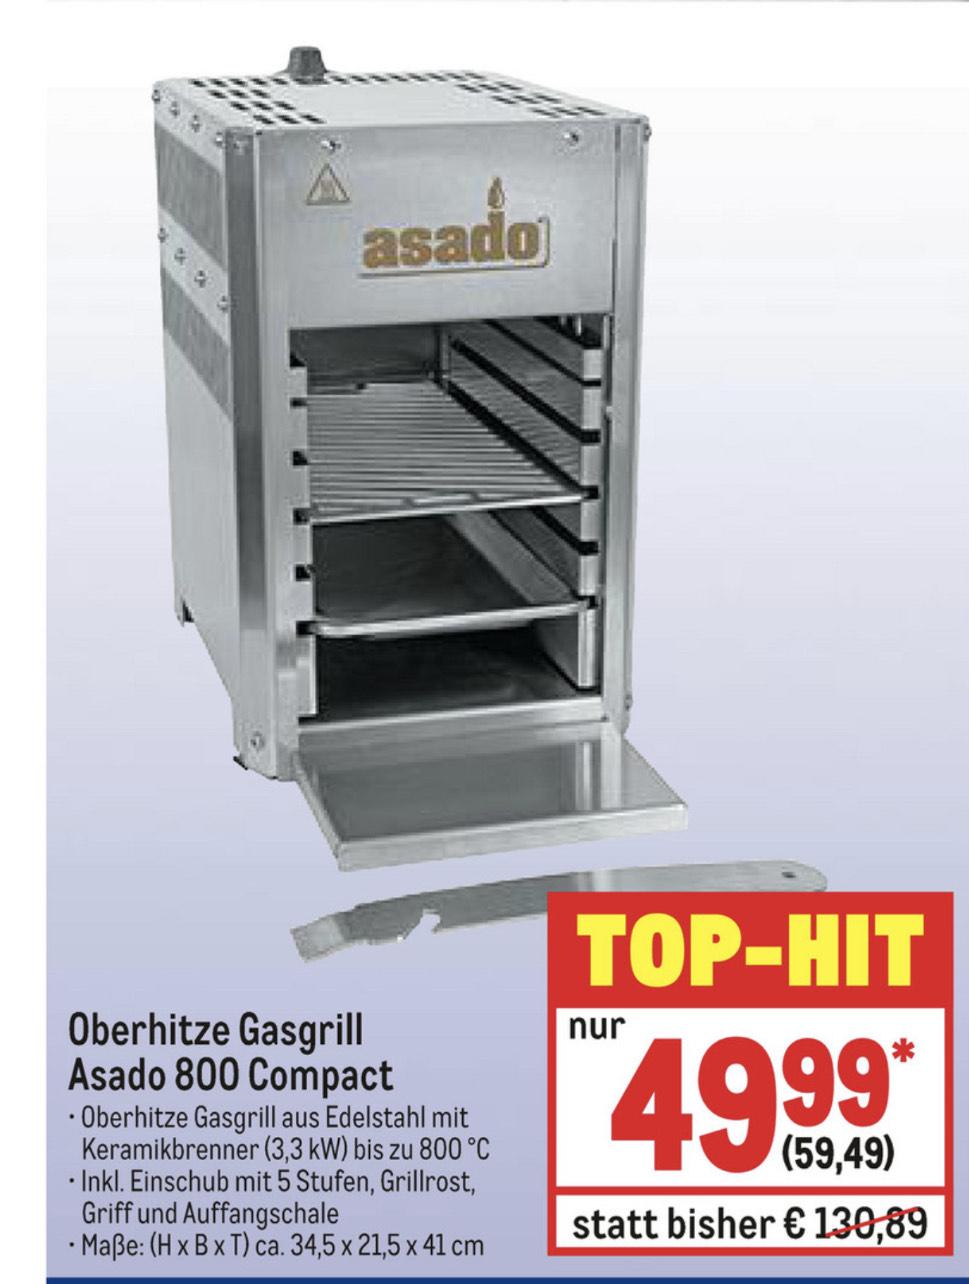 [Metro] Asado 800 Compact Oberhitze Gasgrill / Steakgrill / Beefer ab 23.01.2020 für 59,49€